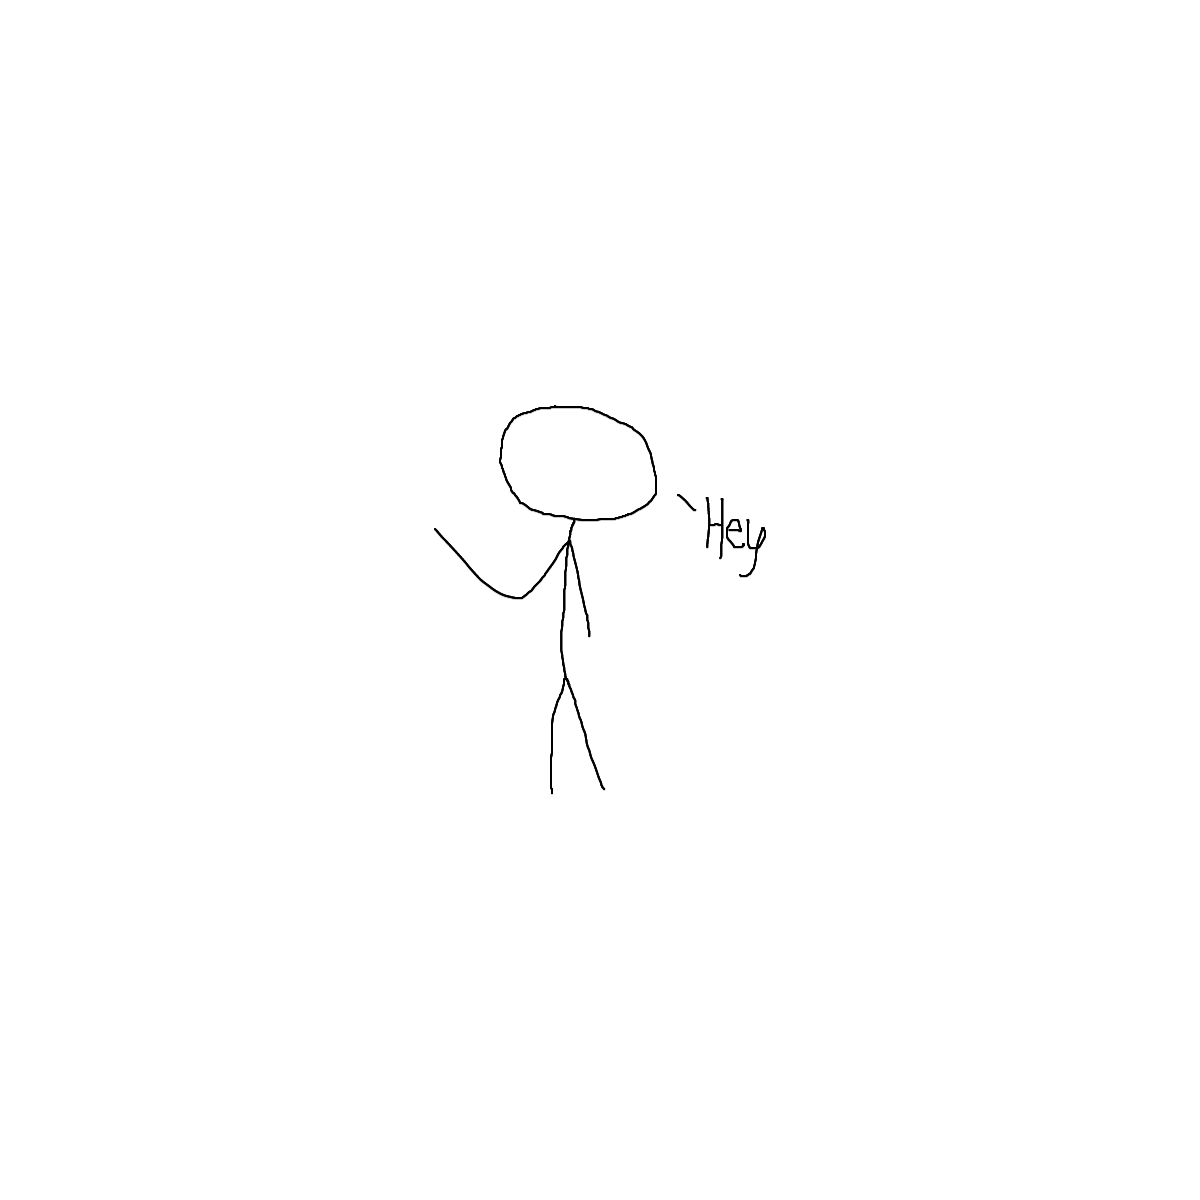 BAAAM drawing#14530 lat:46.4366912841796900lng: -63.6373214721679700